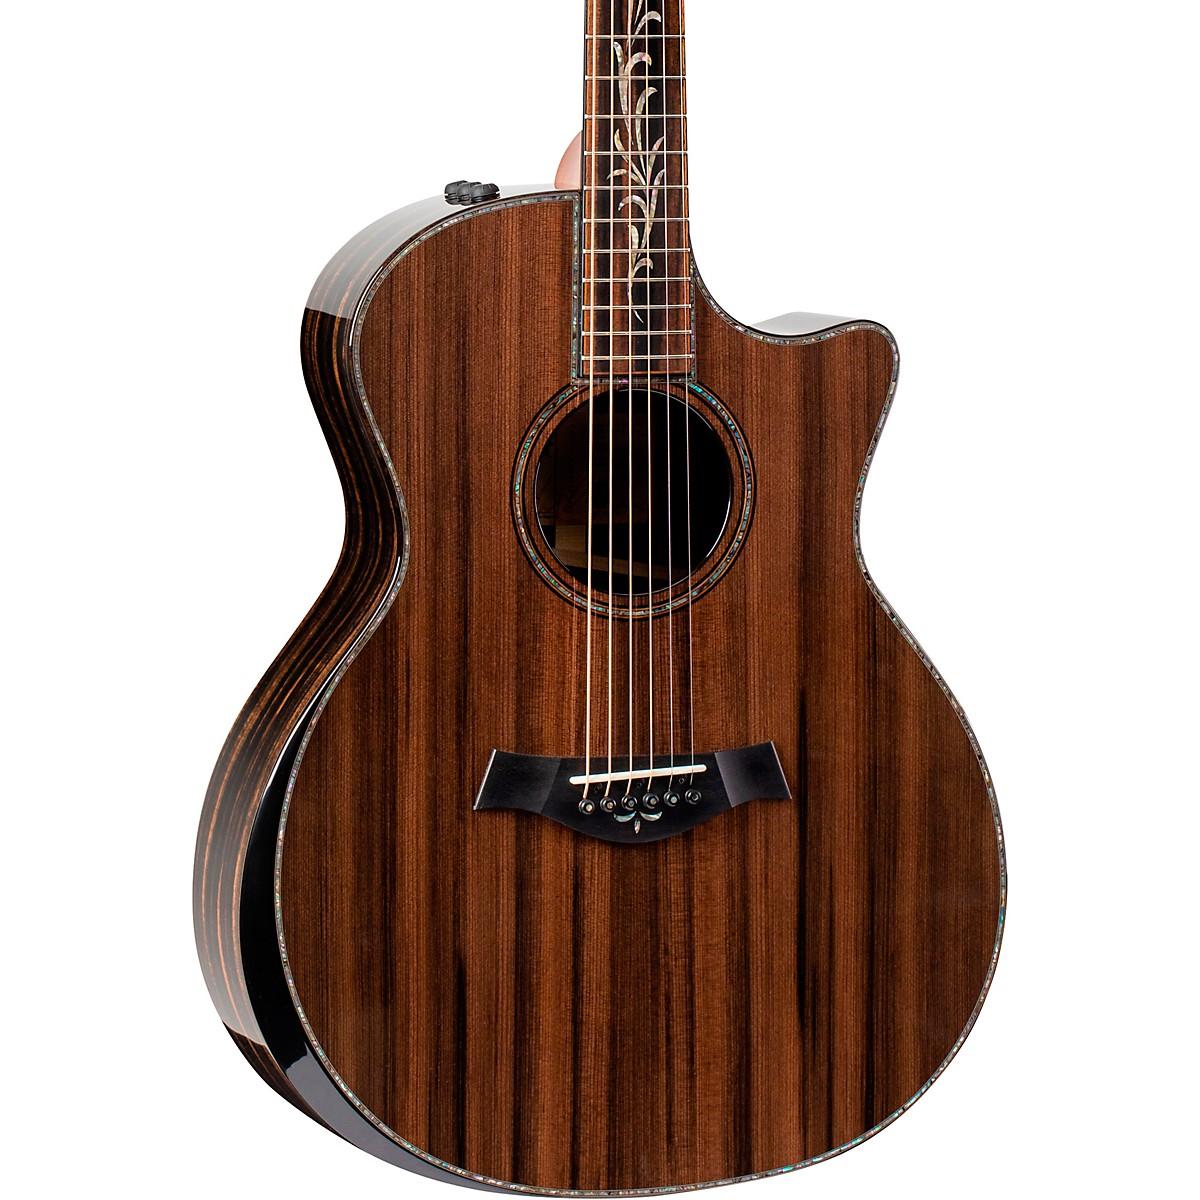 Taylor Custom Limited Edition Ebony Grand Auditorium Acoustic-Electric Guitar